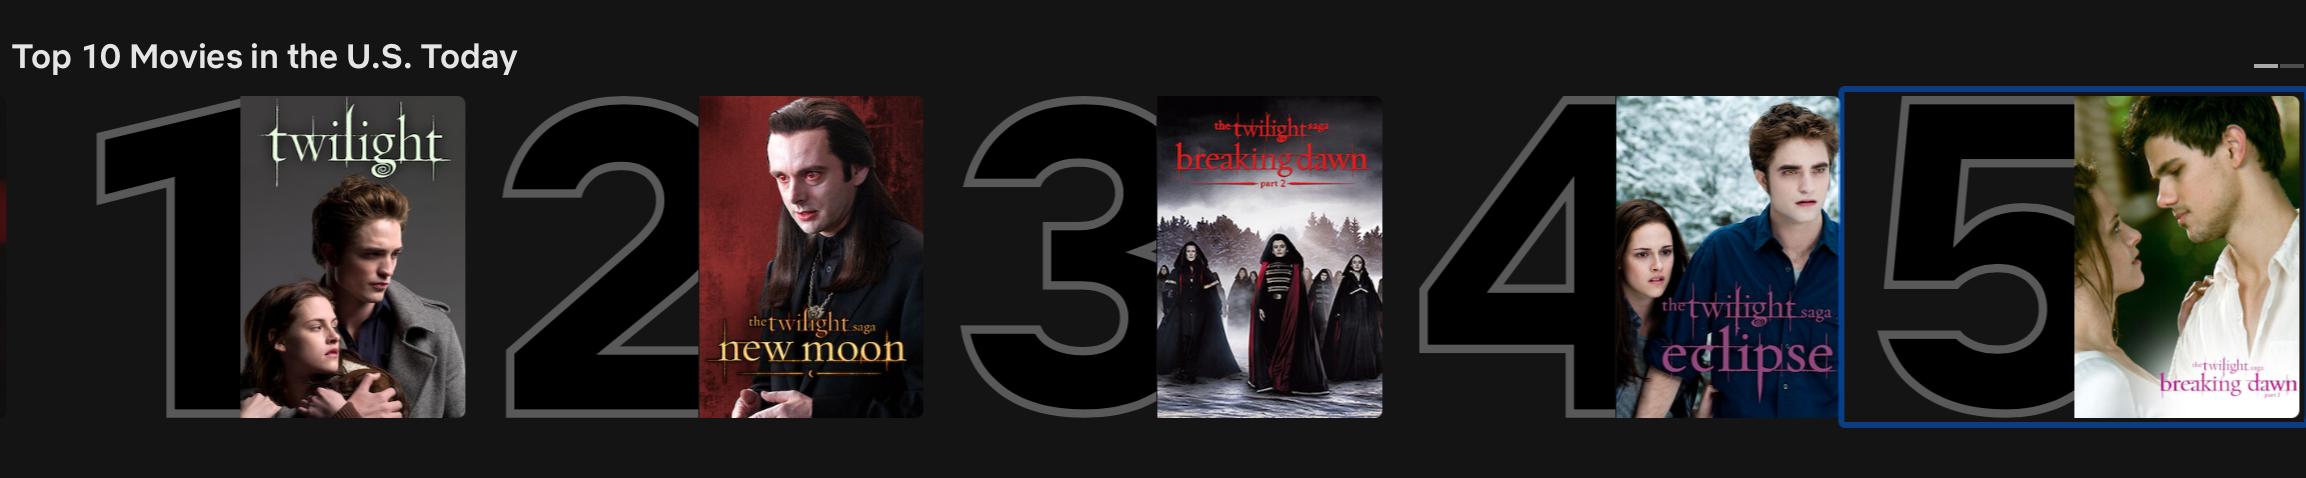 Netflix top 10 twilight